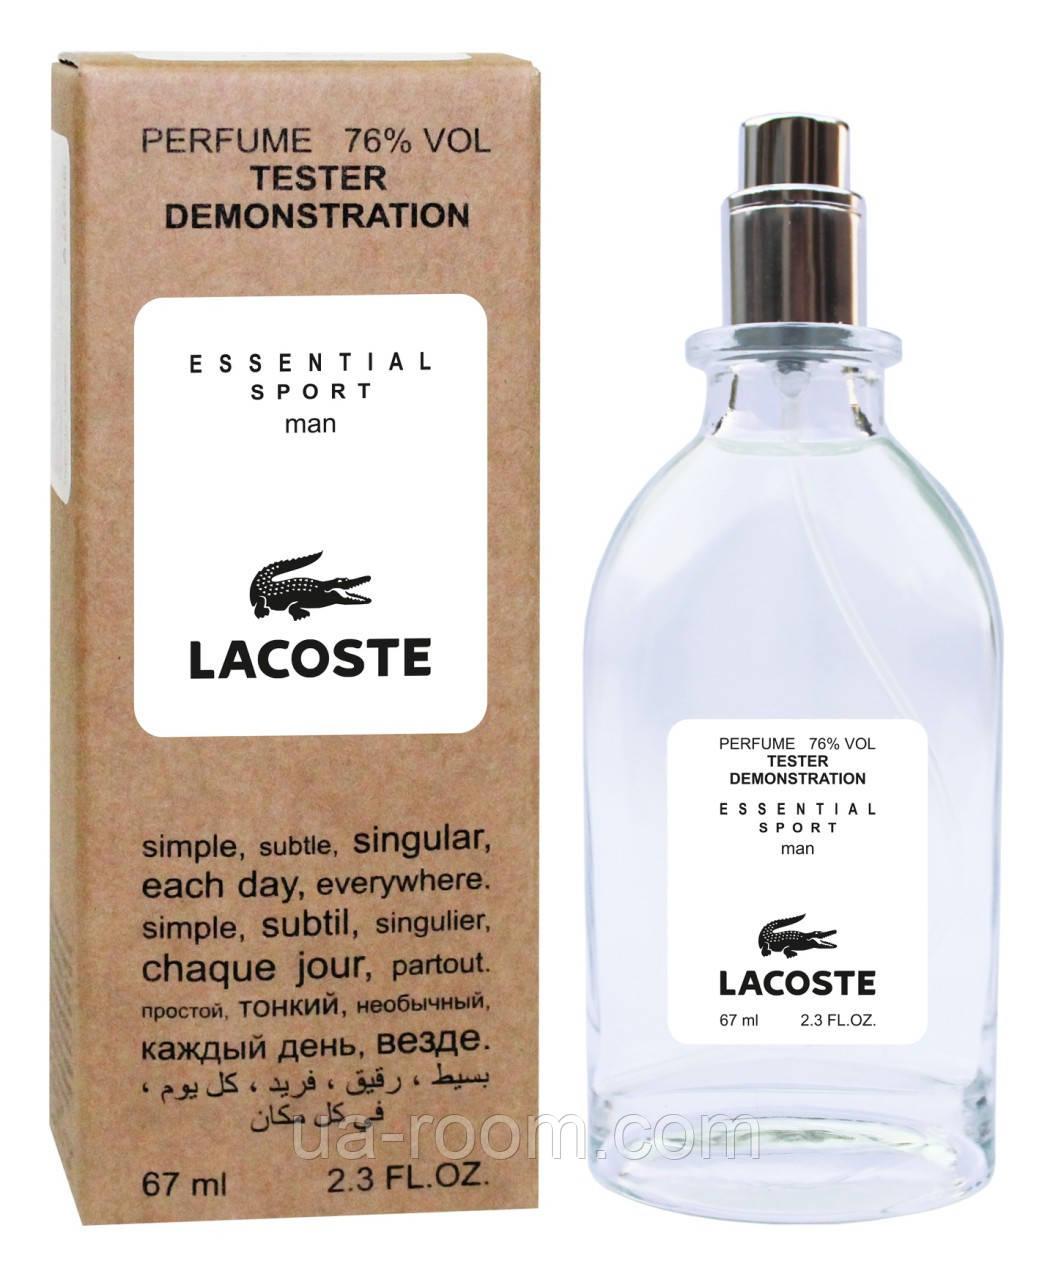 Тестер мужской LACOSTE Essential Sport    67 мл.